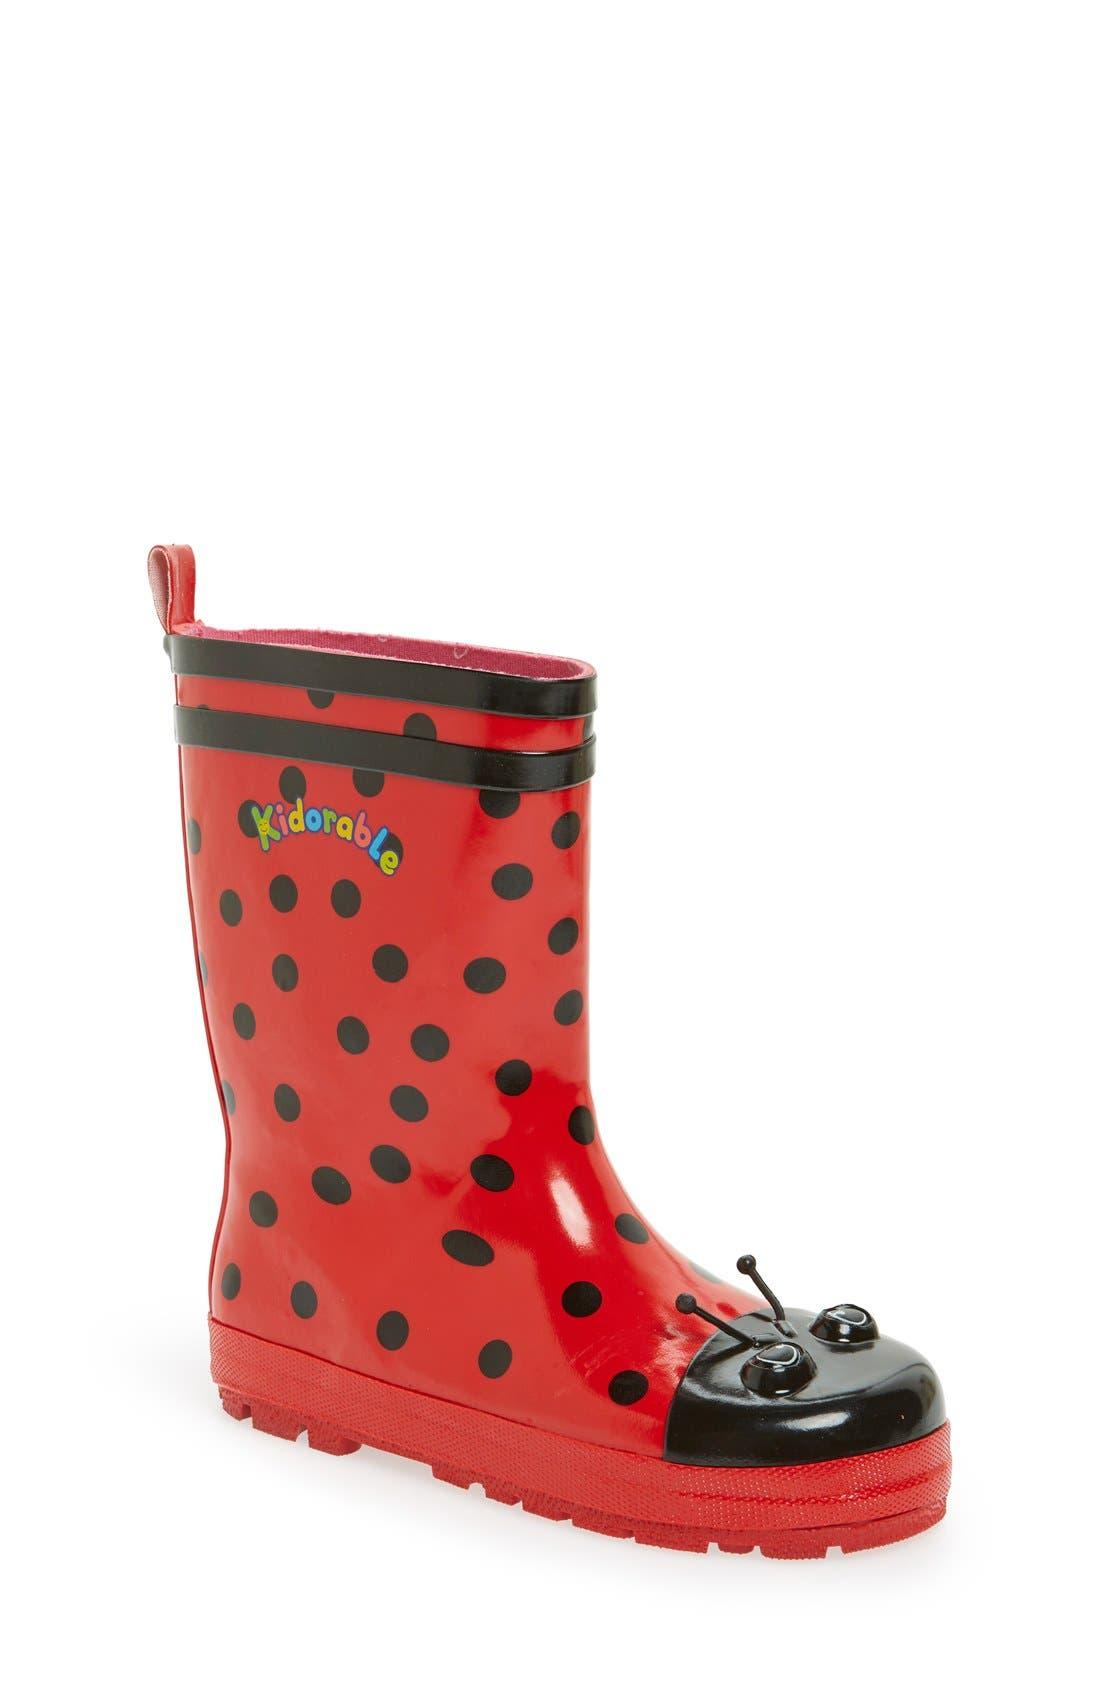 'Ladybug' Waterproof Rain Boot,                         Main,                         color, Red